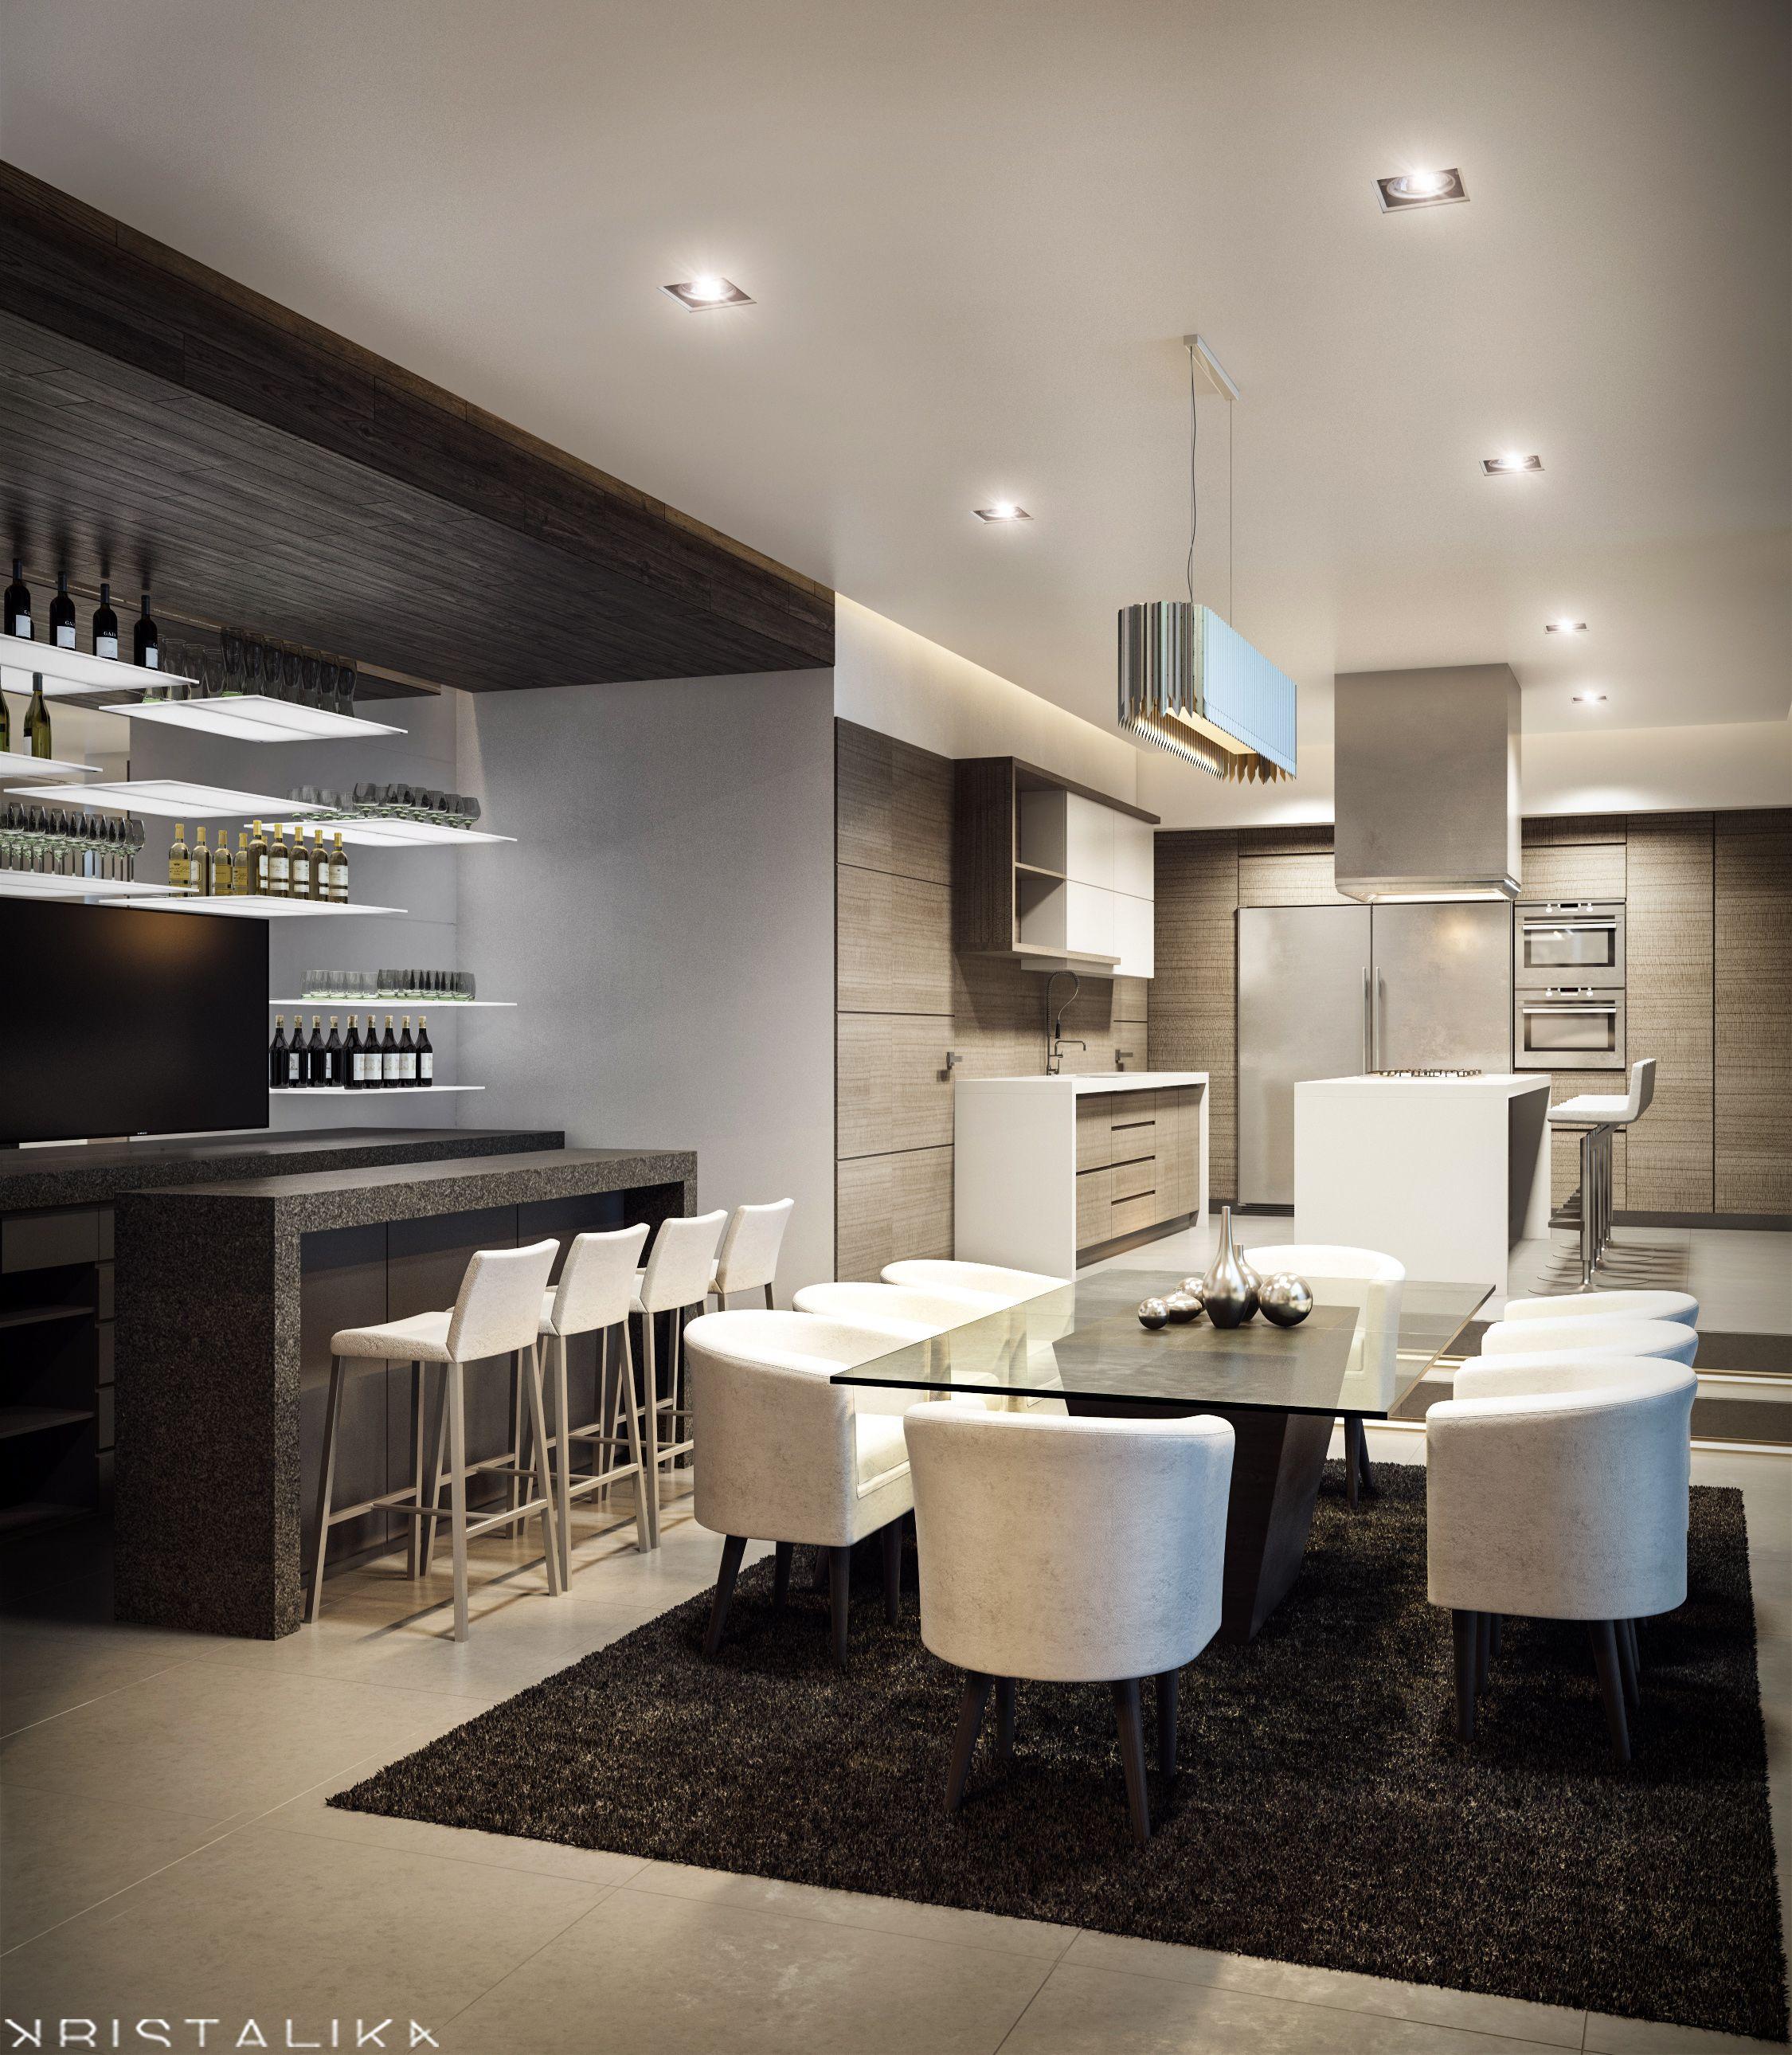 Pin de kristalika en kristalika arquitecture and interior for Interior cocinas modernas